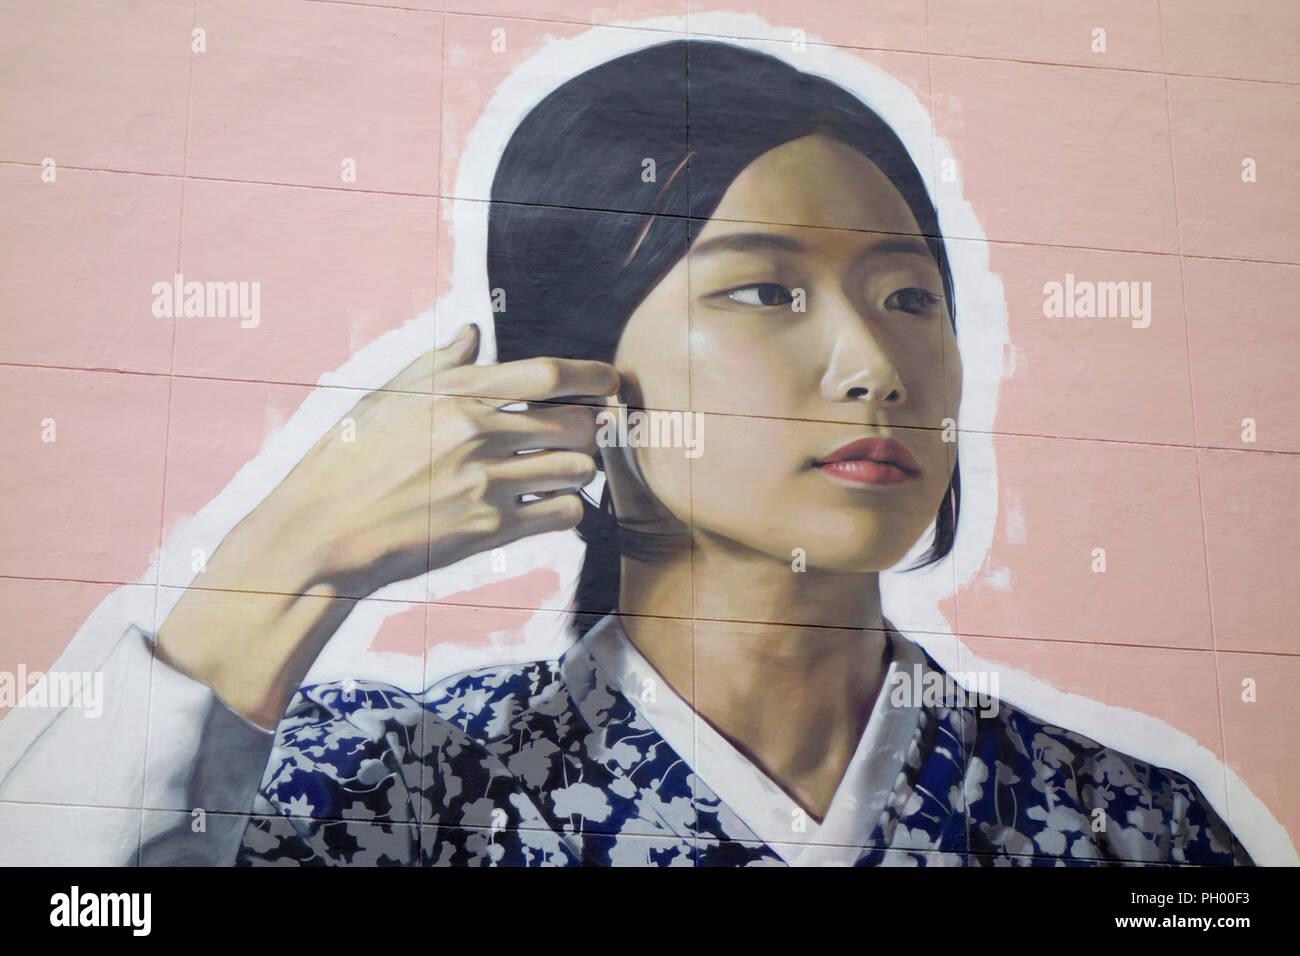 Graffiti Artworks in Seoul depicting a Korean woman in traditional Korean Hanbok clothing. Painted as part of POW! WOW! Korea 2017. - Stock Image